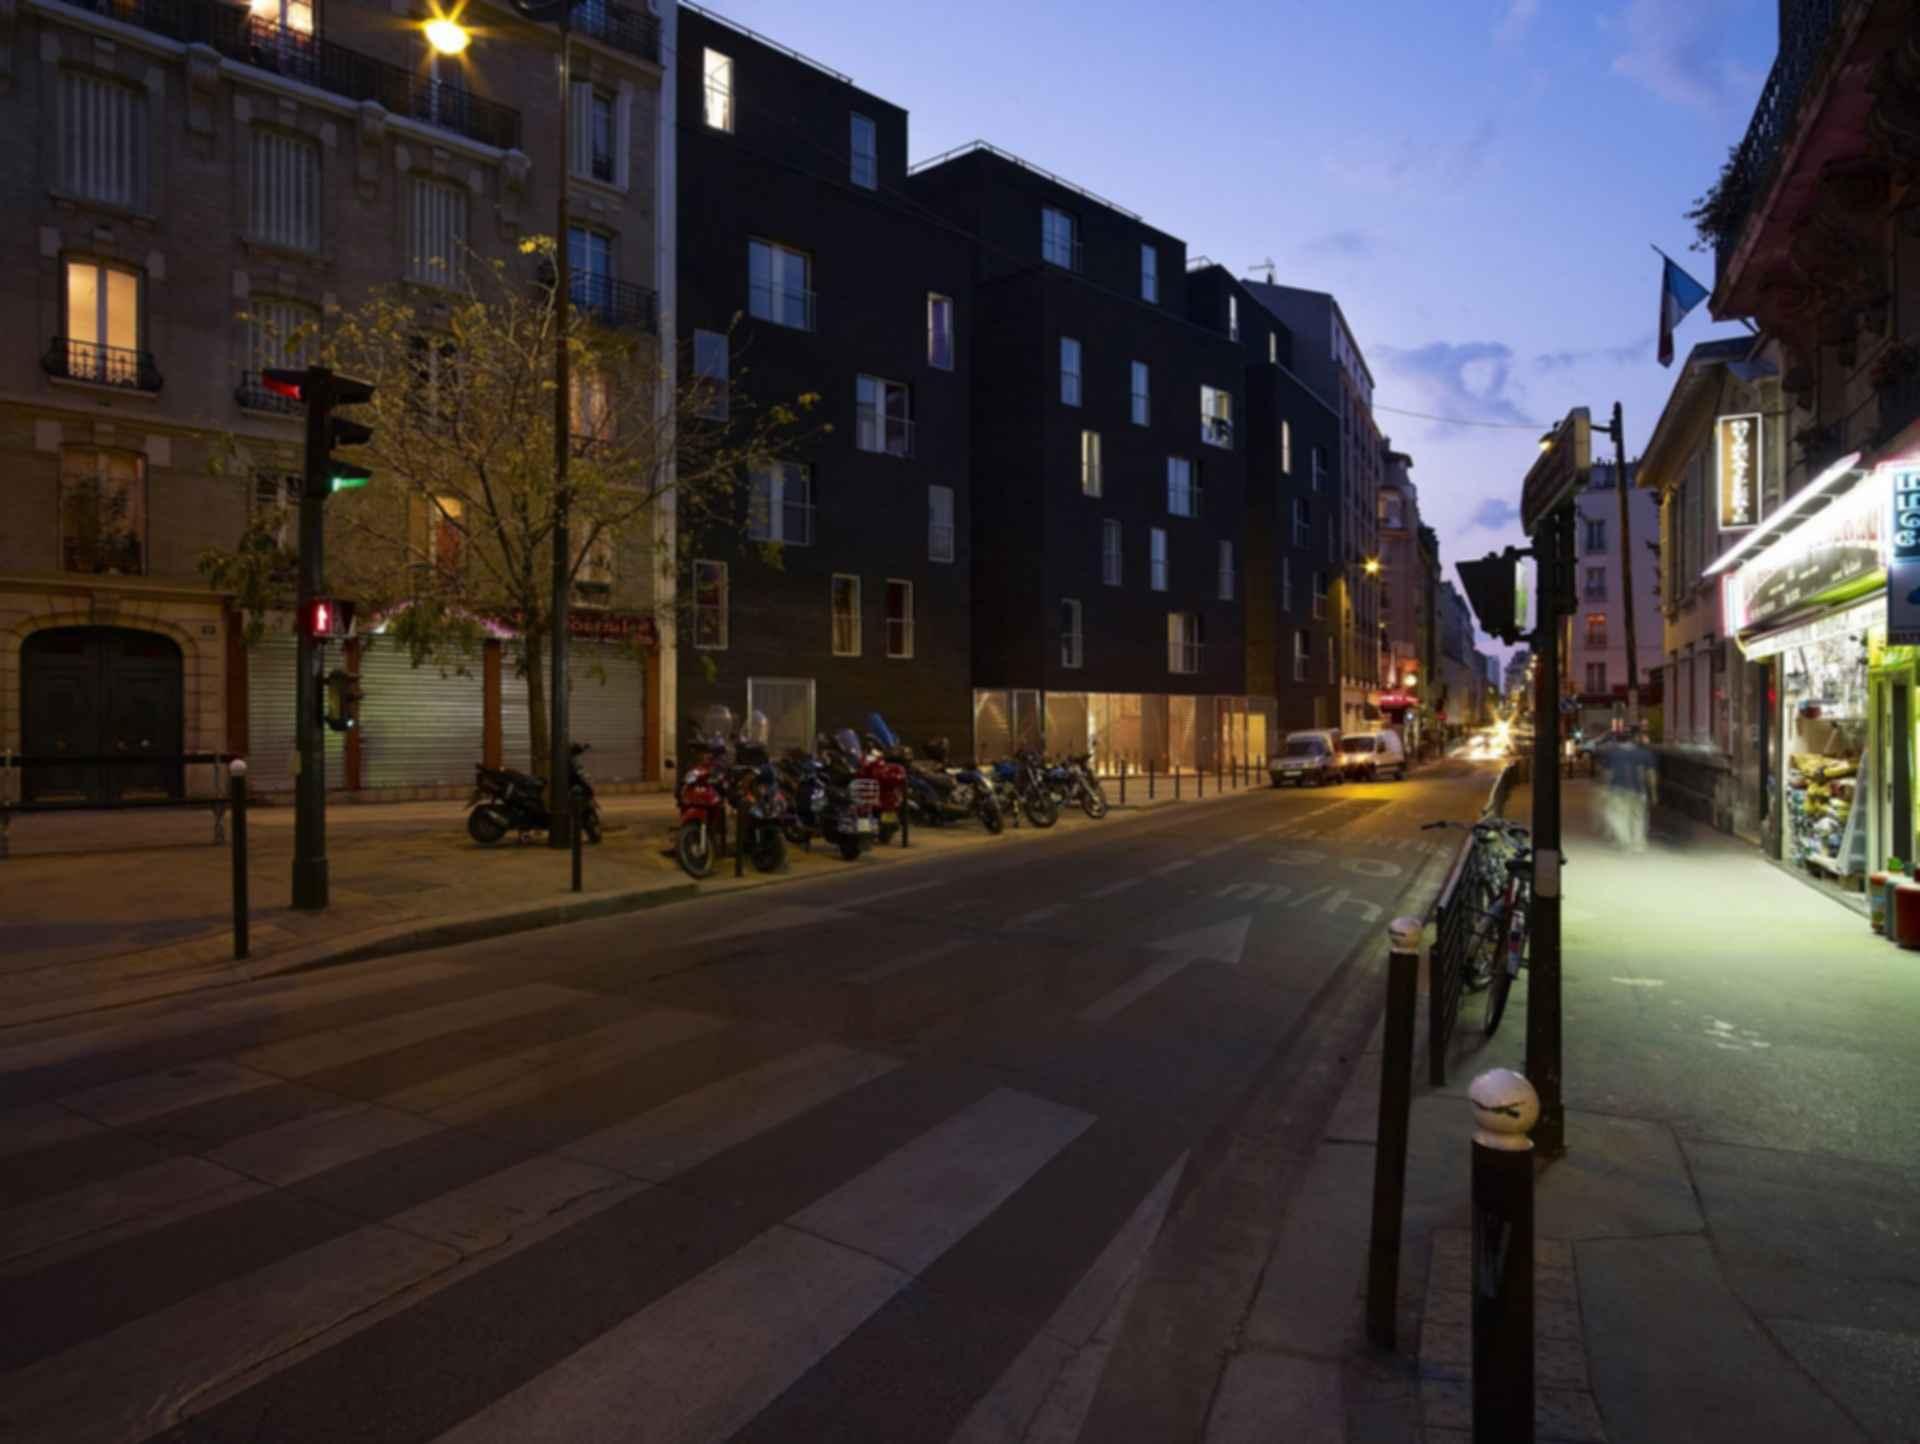 Student Residences in Paris - Exterior